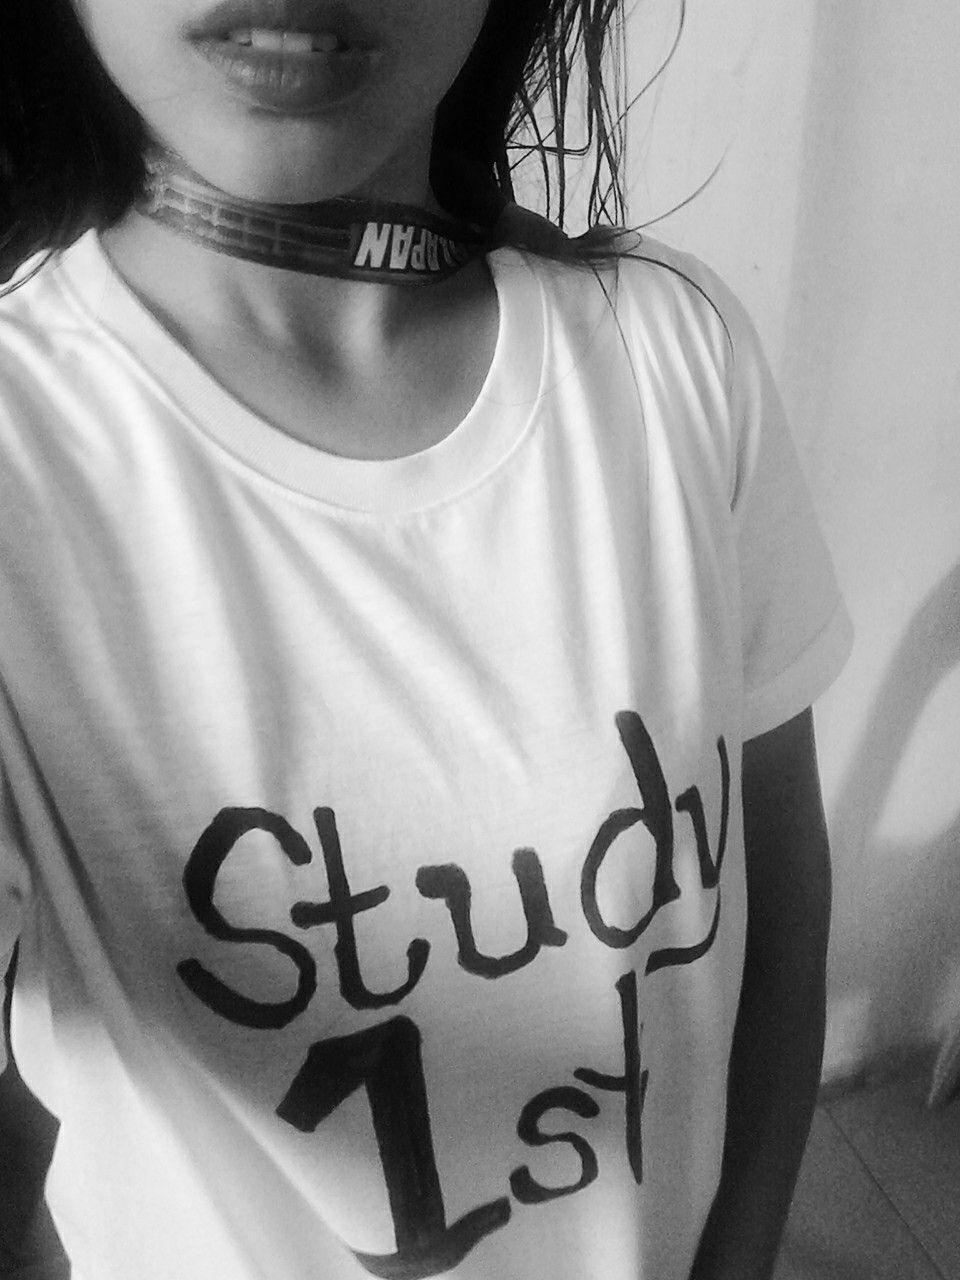 Study First DIY